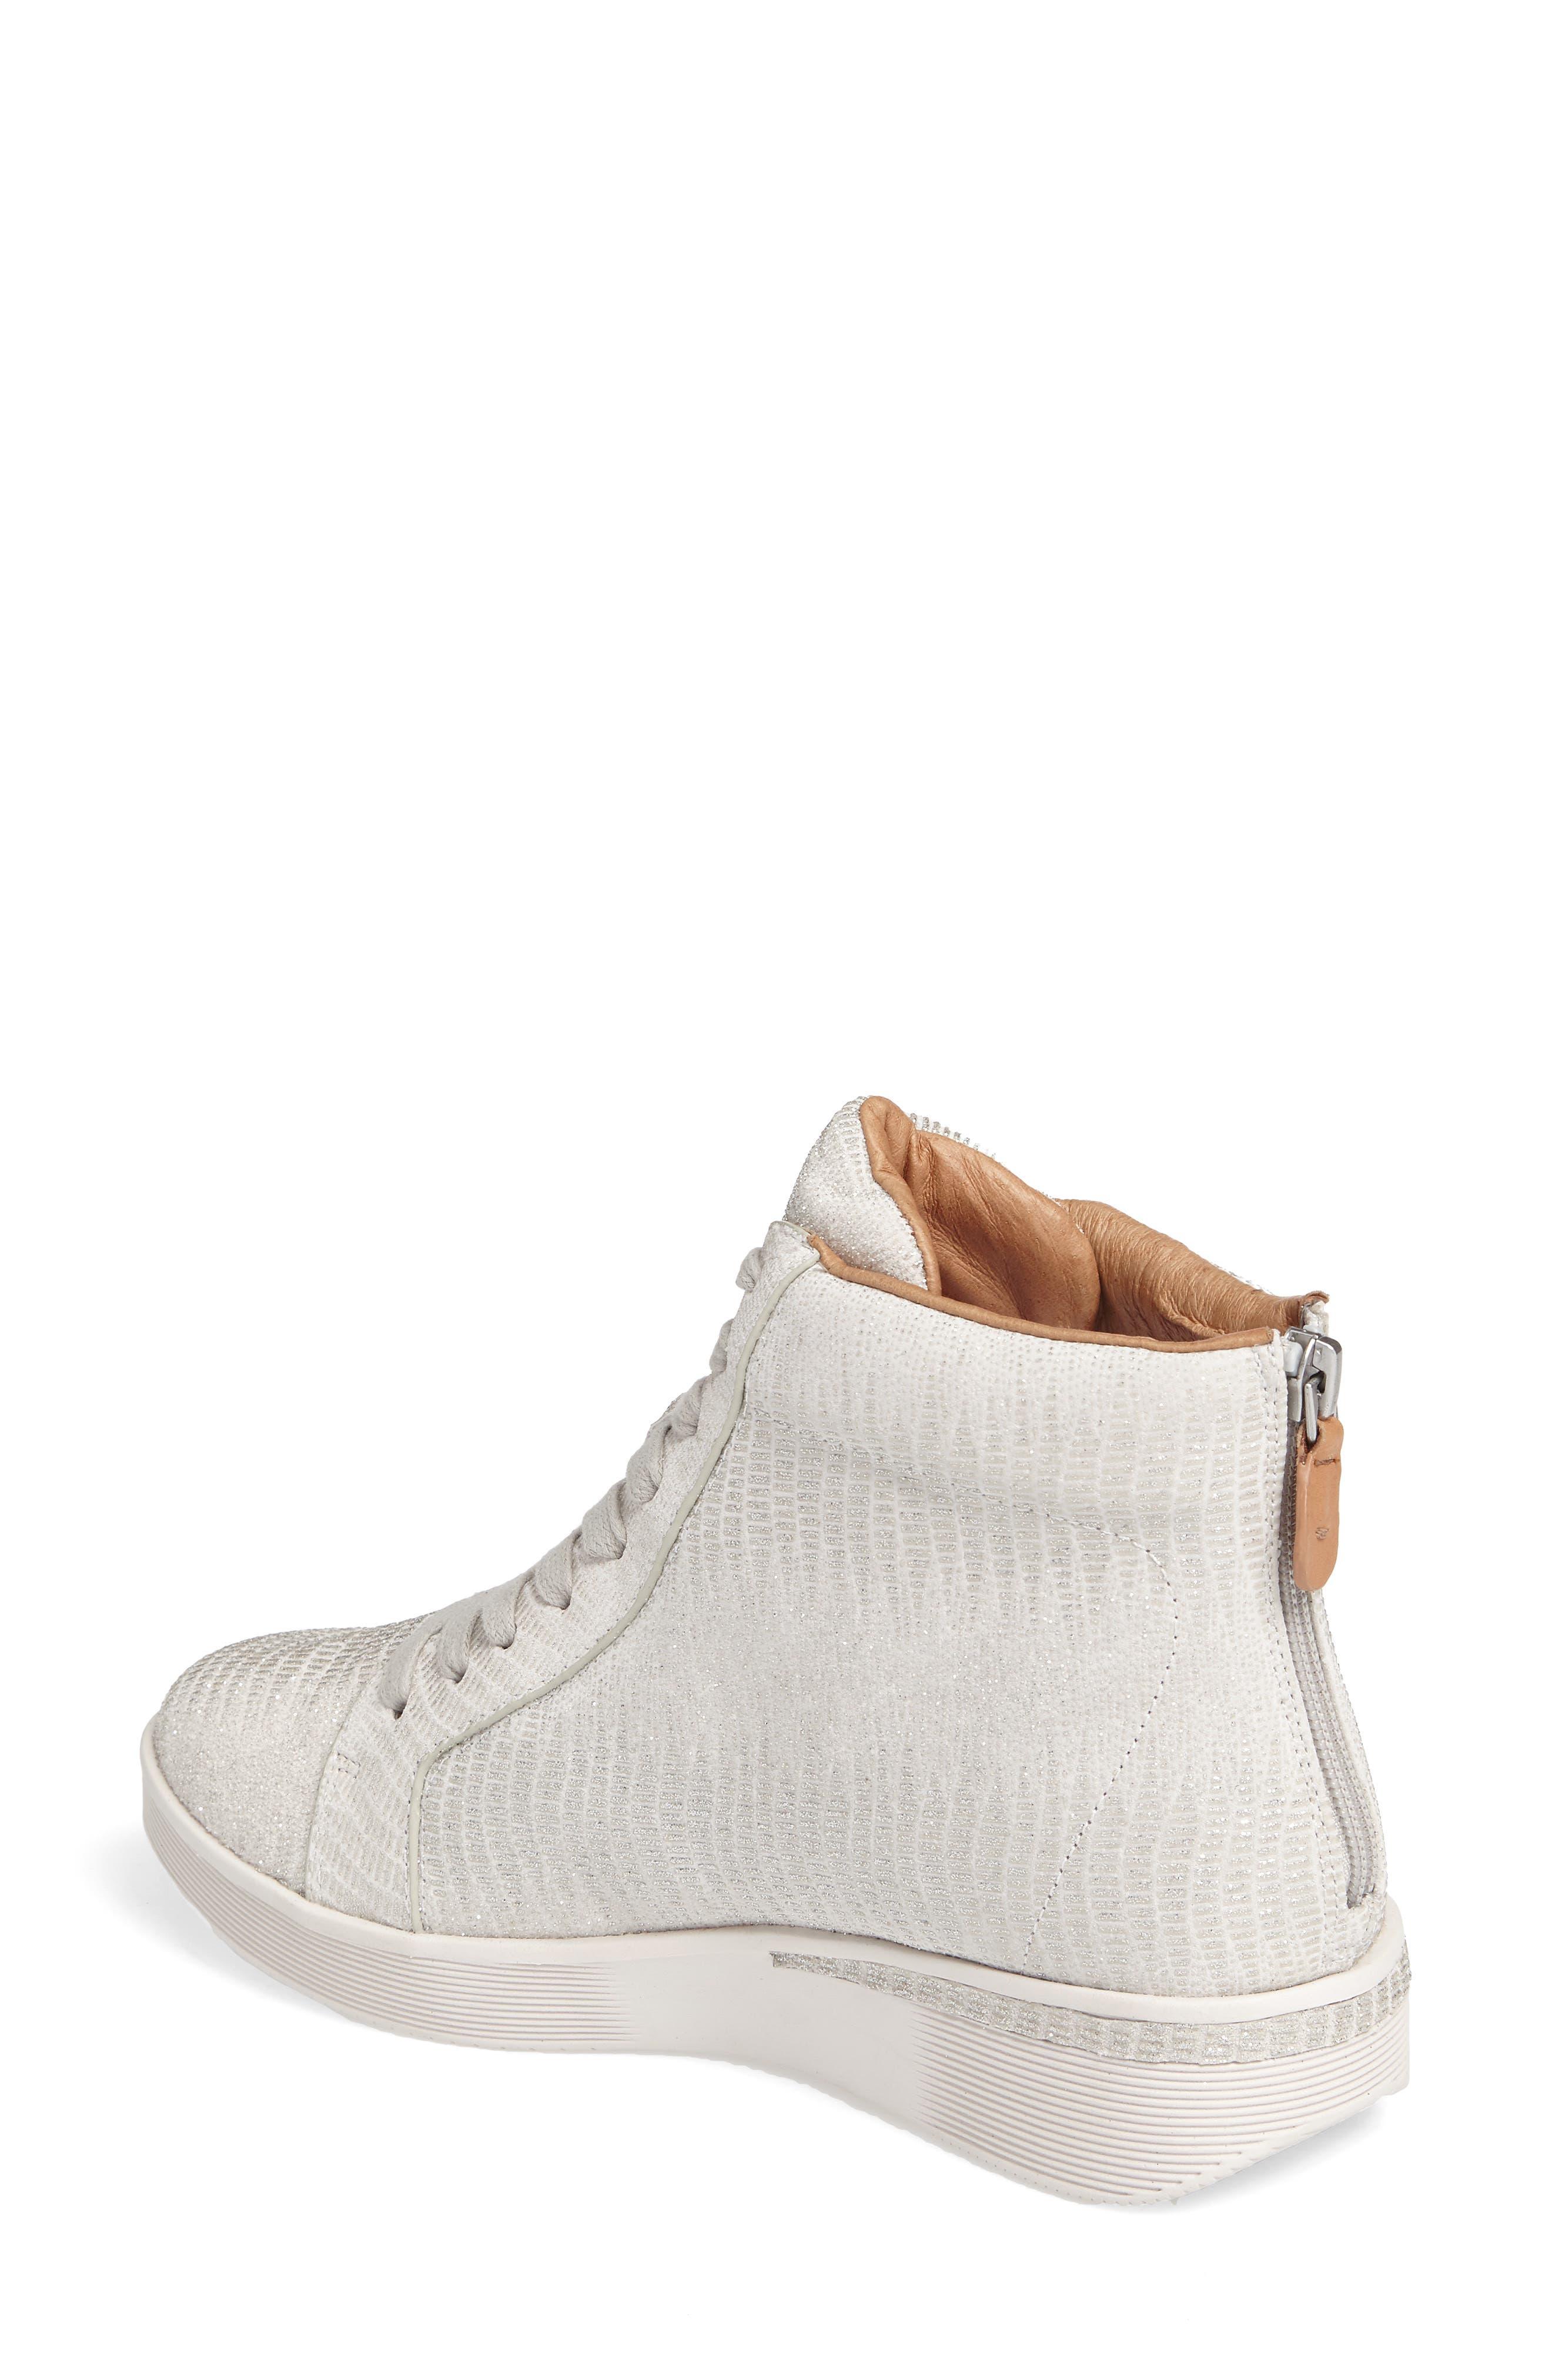 Helka High Top Sneaker,                             Alternate thumbnail 4, color,